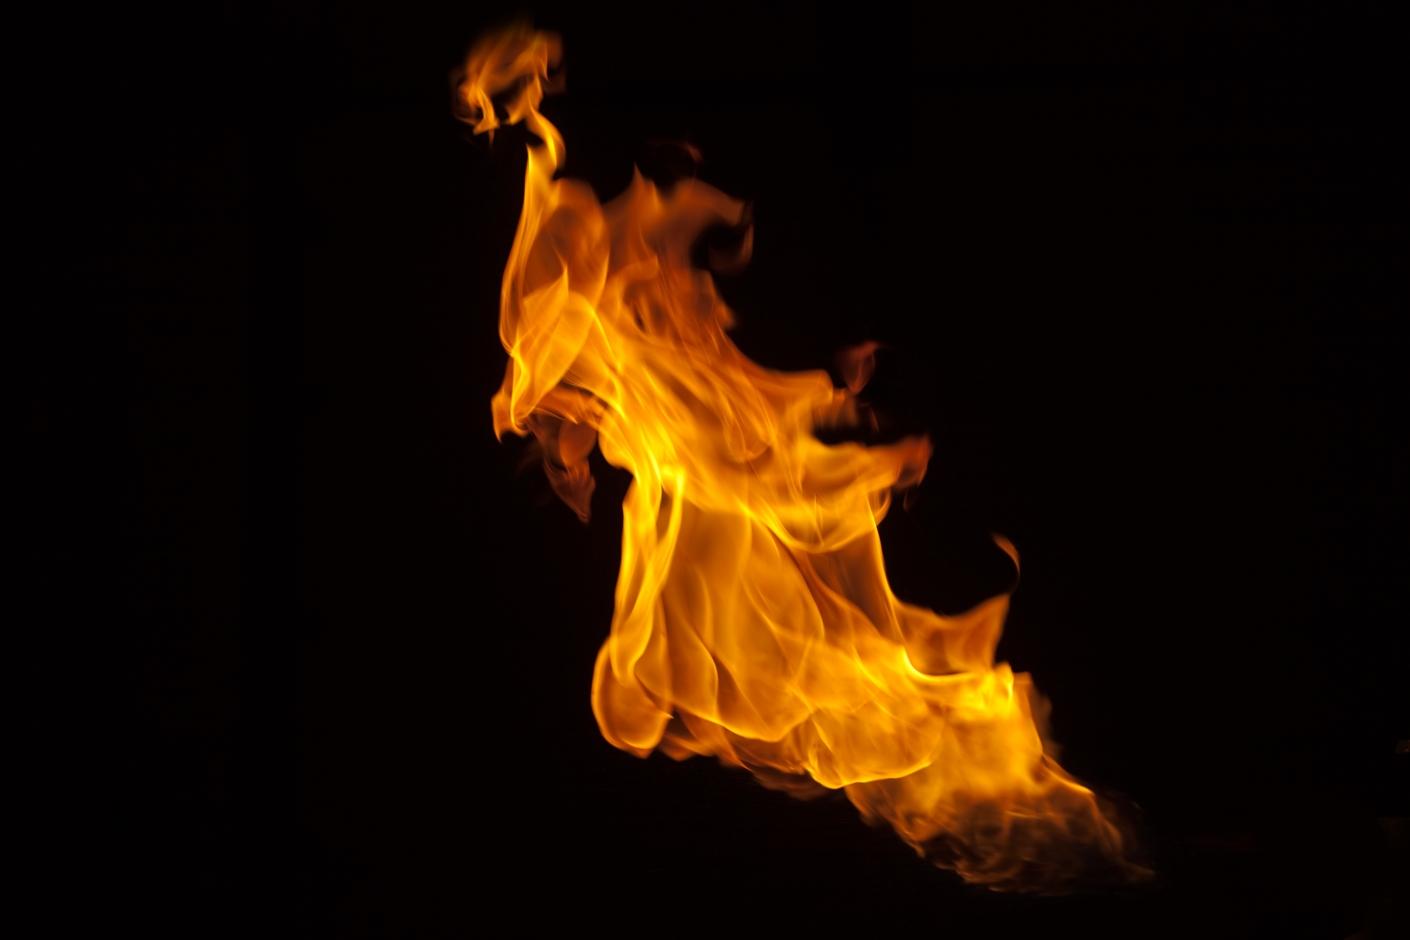 fireb5